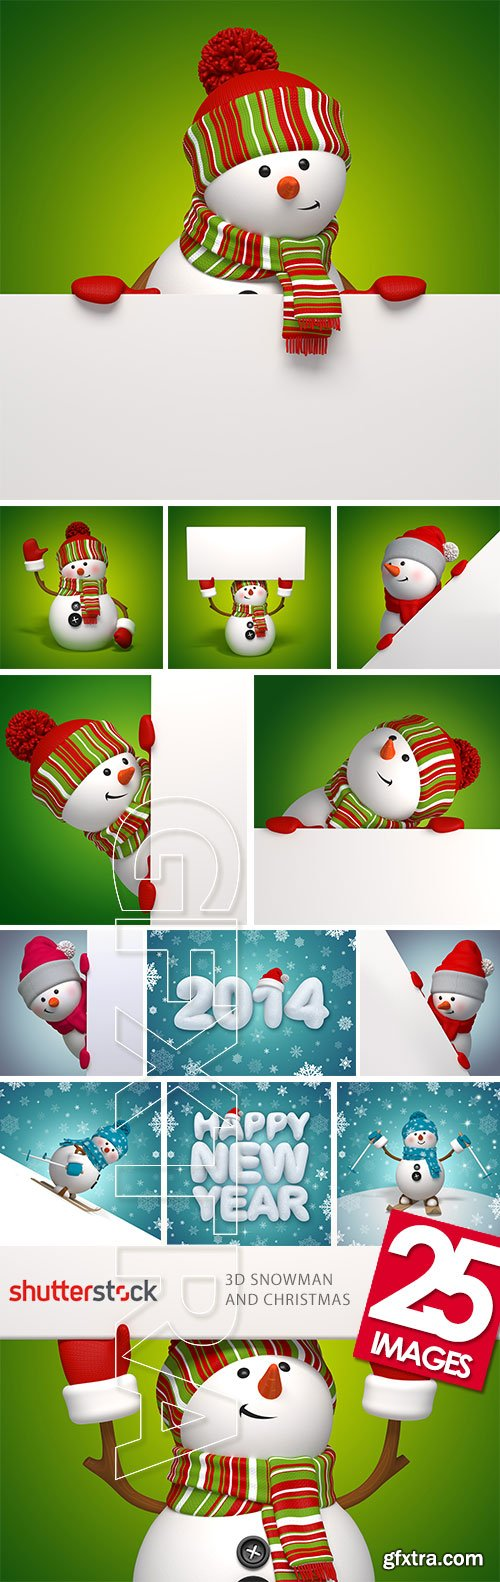 3D Snowman and Christmas 25xJPGs